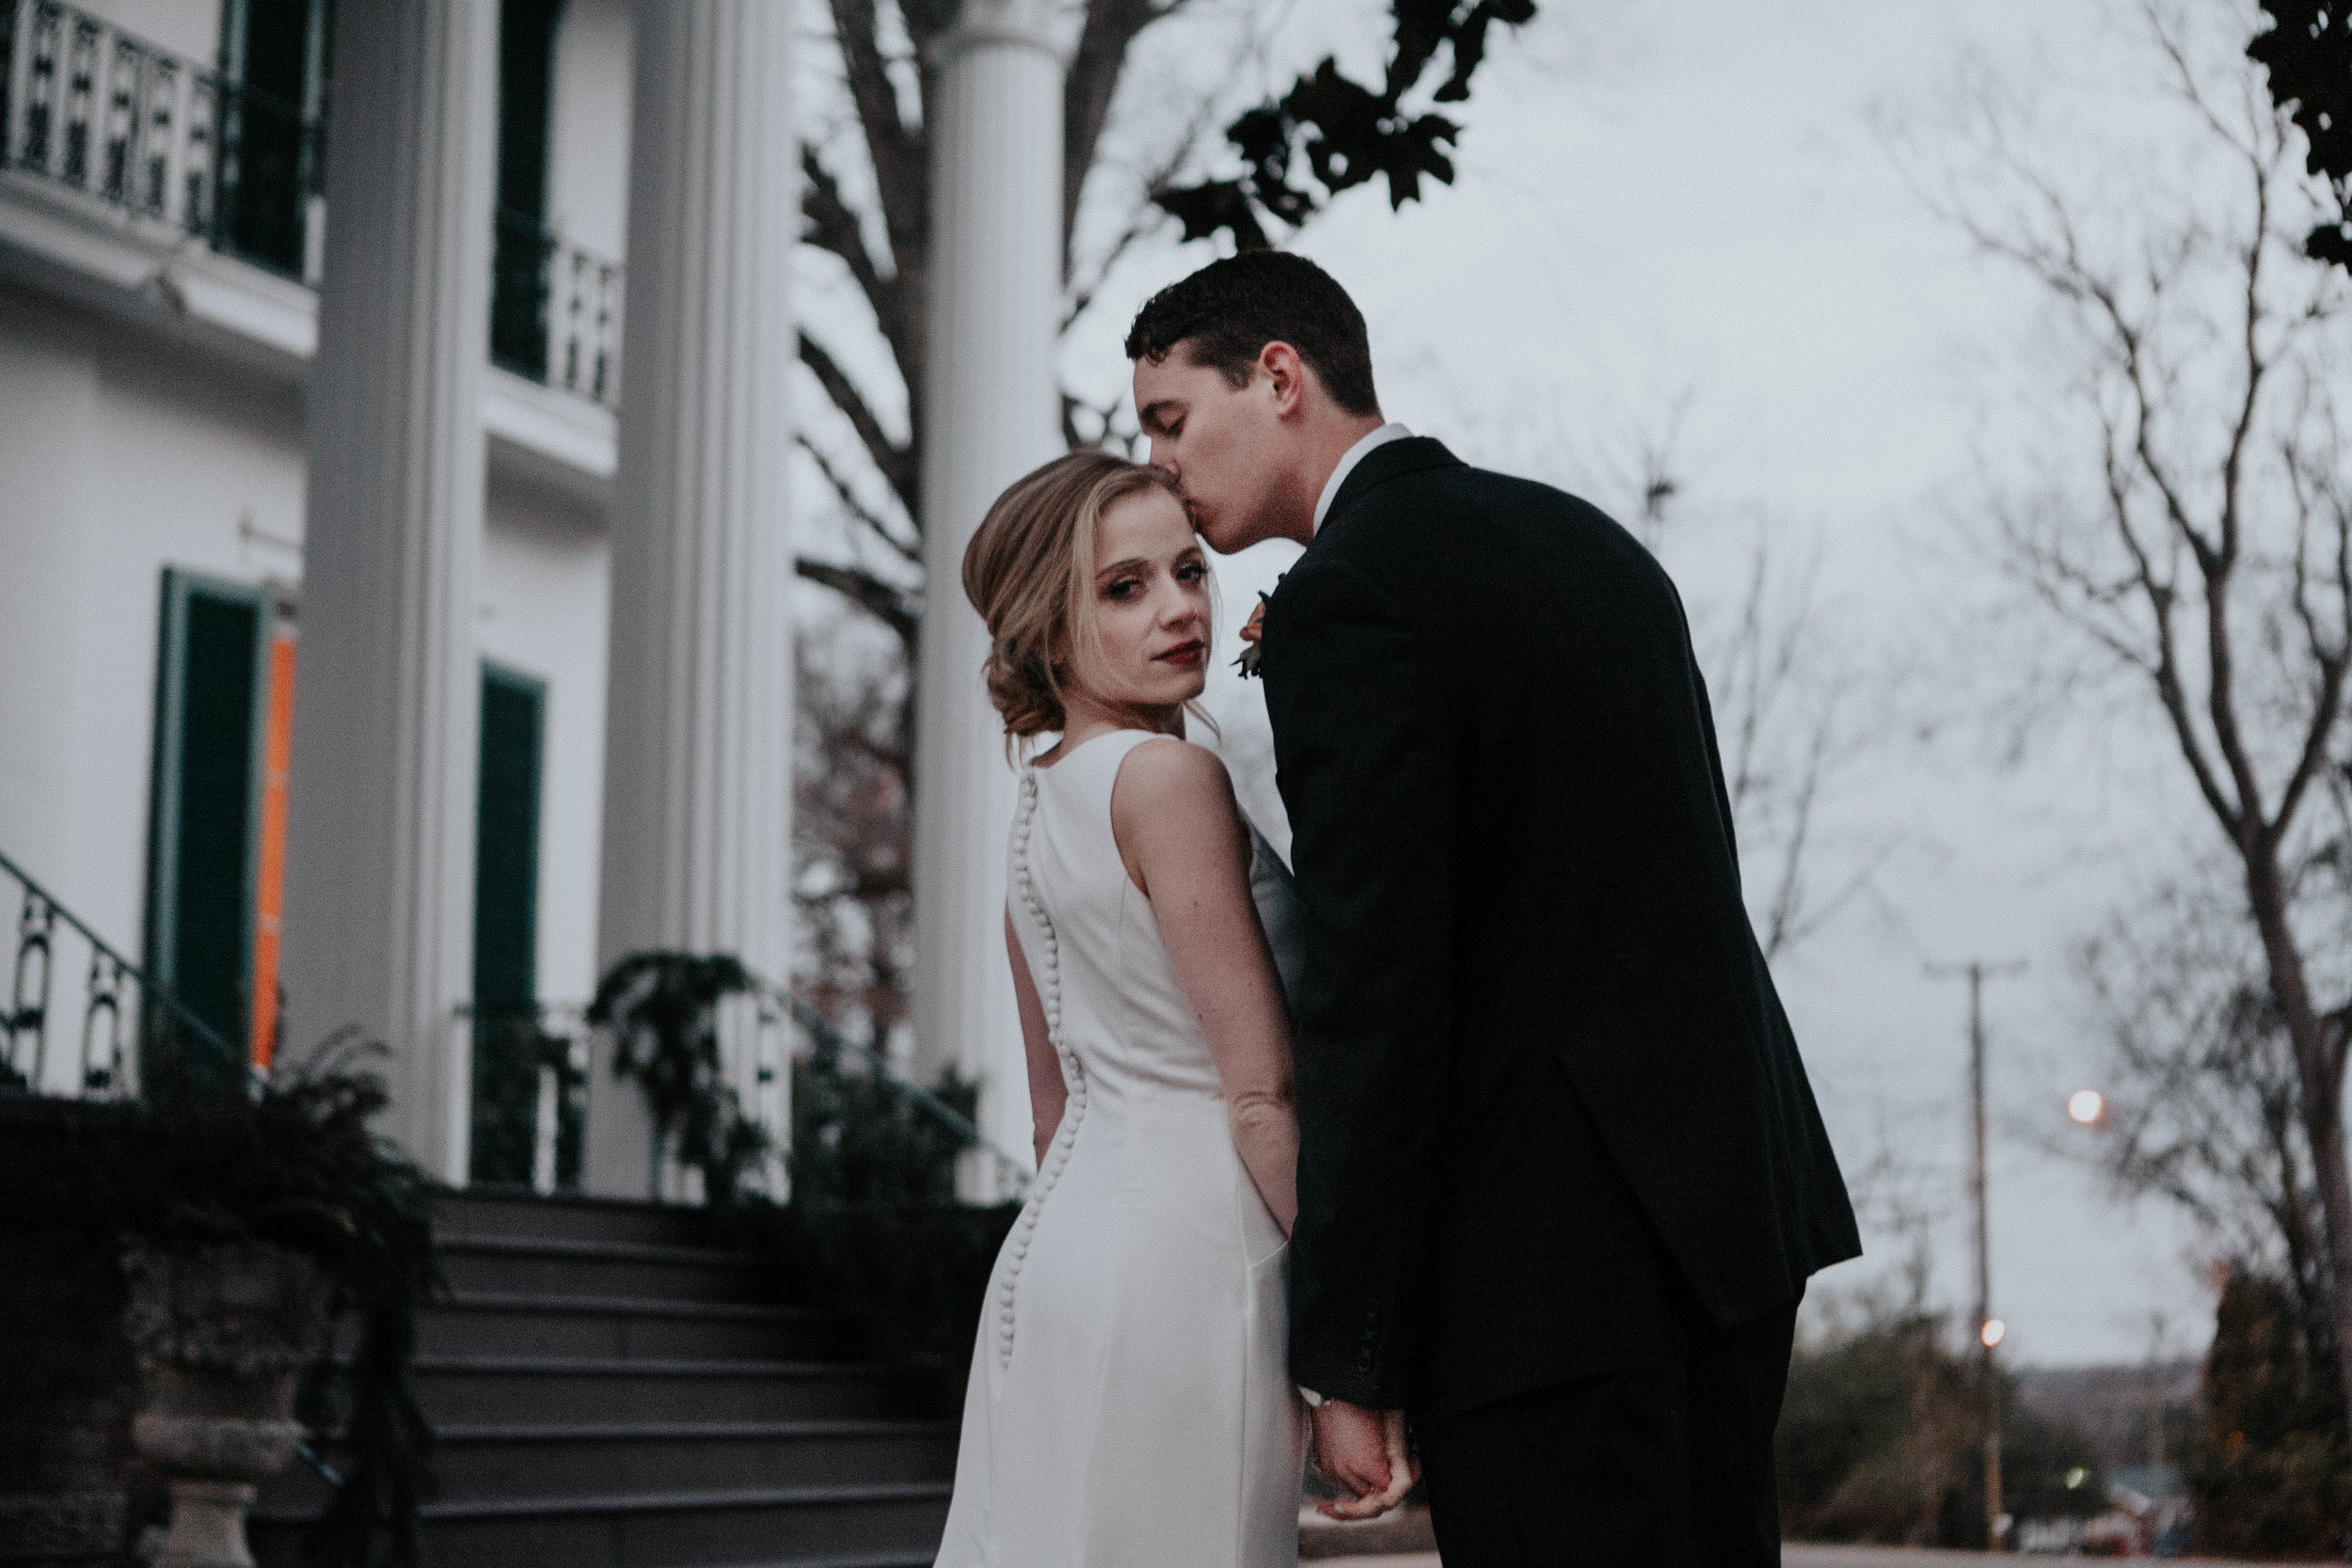 Charis_Lauren_Romantic_Wedding_Photographer_Nashville_0113.jpg